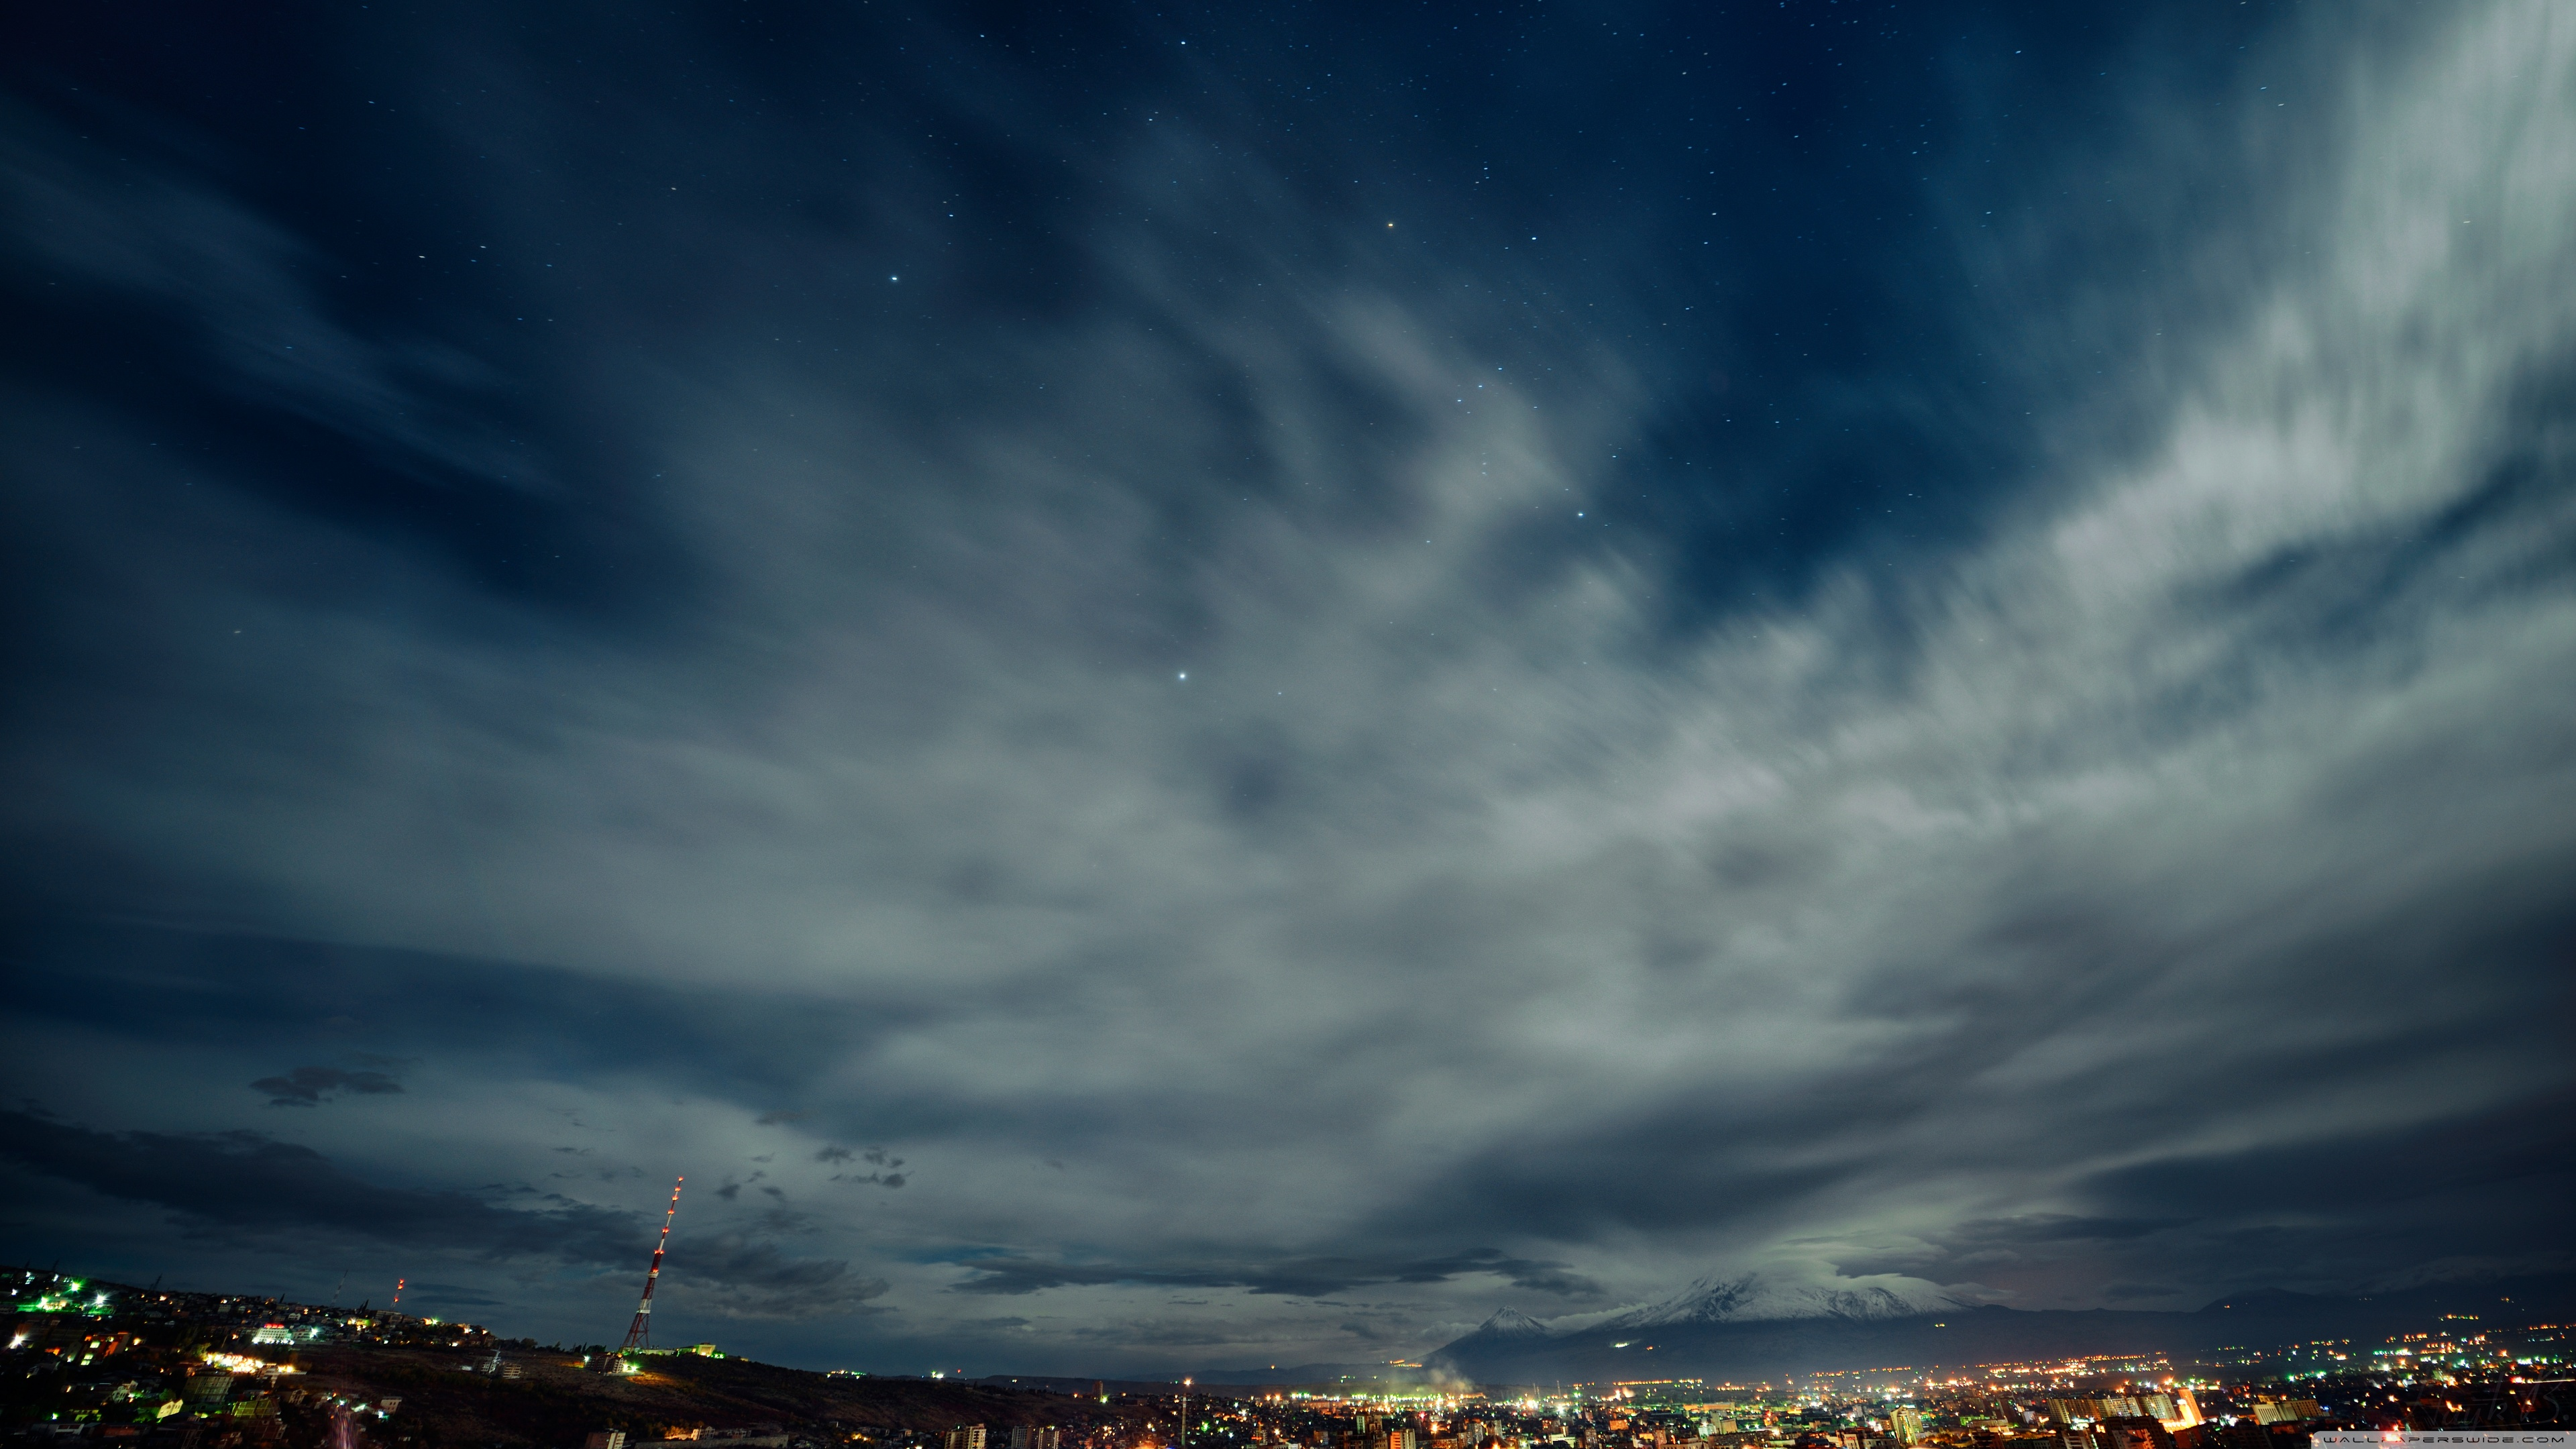 city night sky hd - photo #38